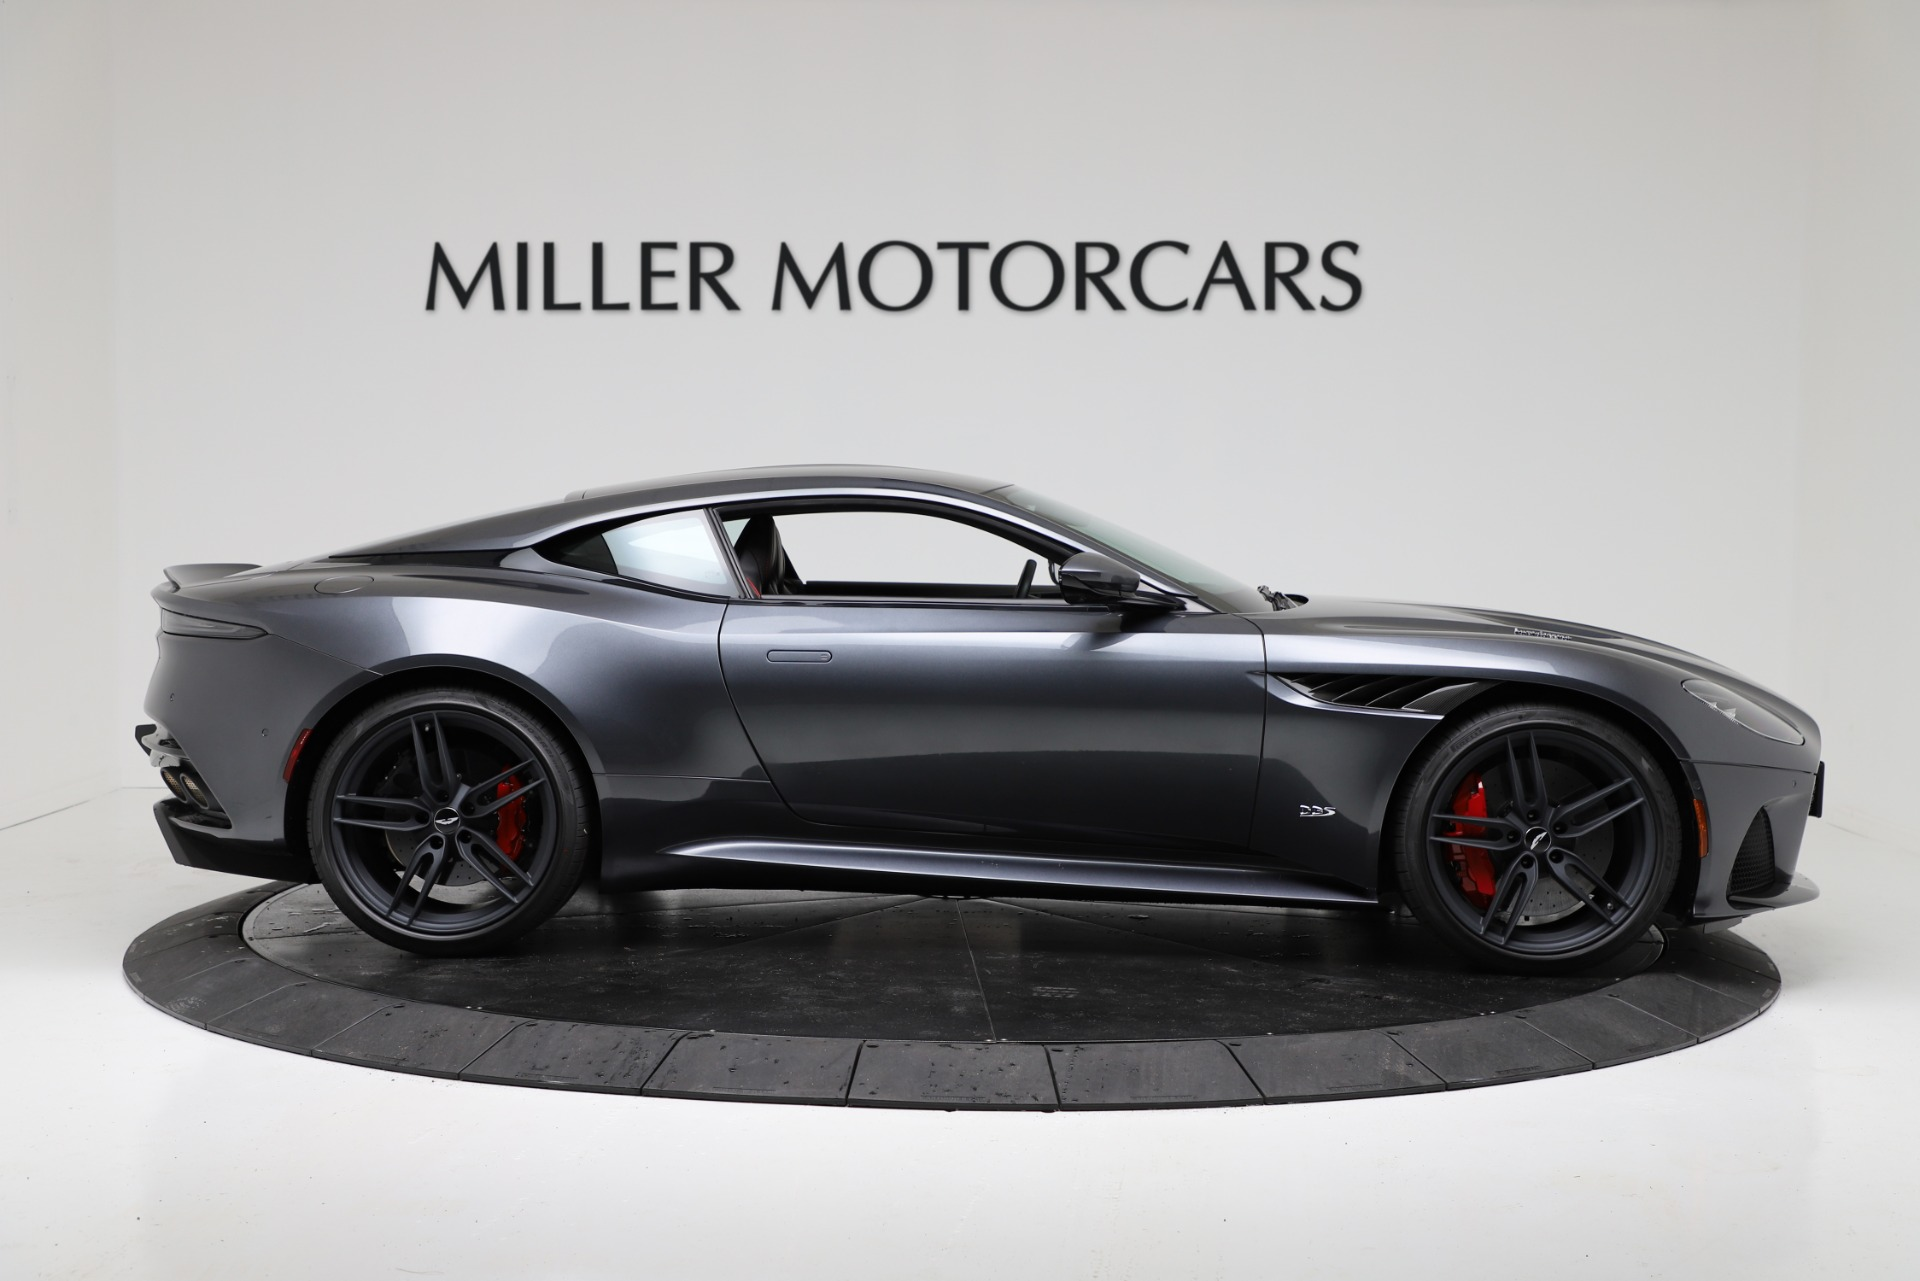 New 2019 Aston Martin DBS Superleggera For Sale In Greenwich, CT 3318_p8